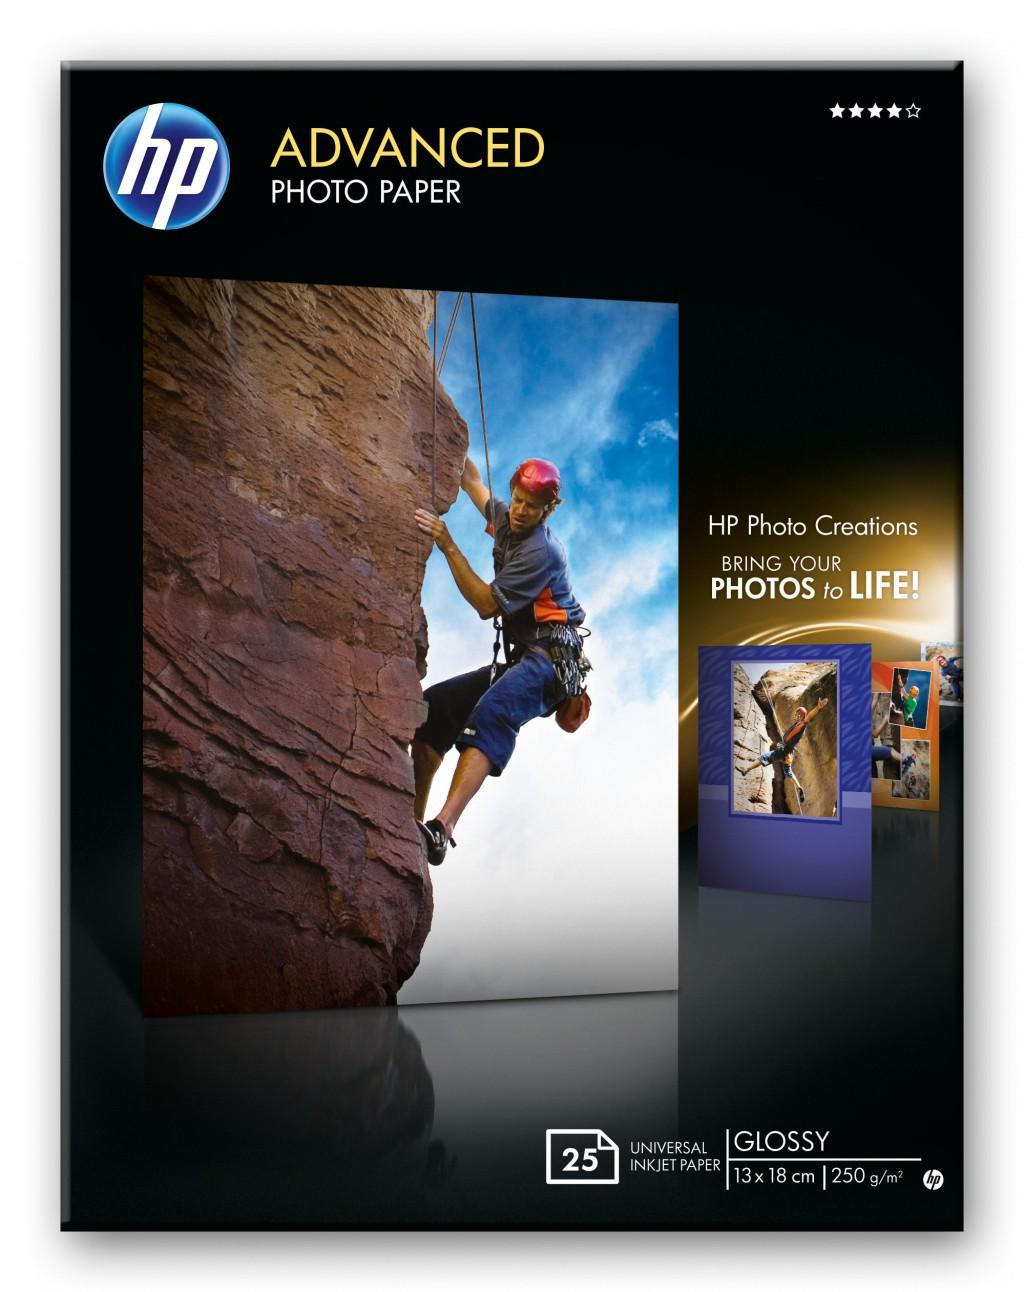 HP advanced photopaper glossy borderless